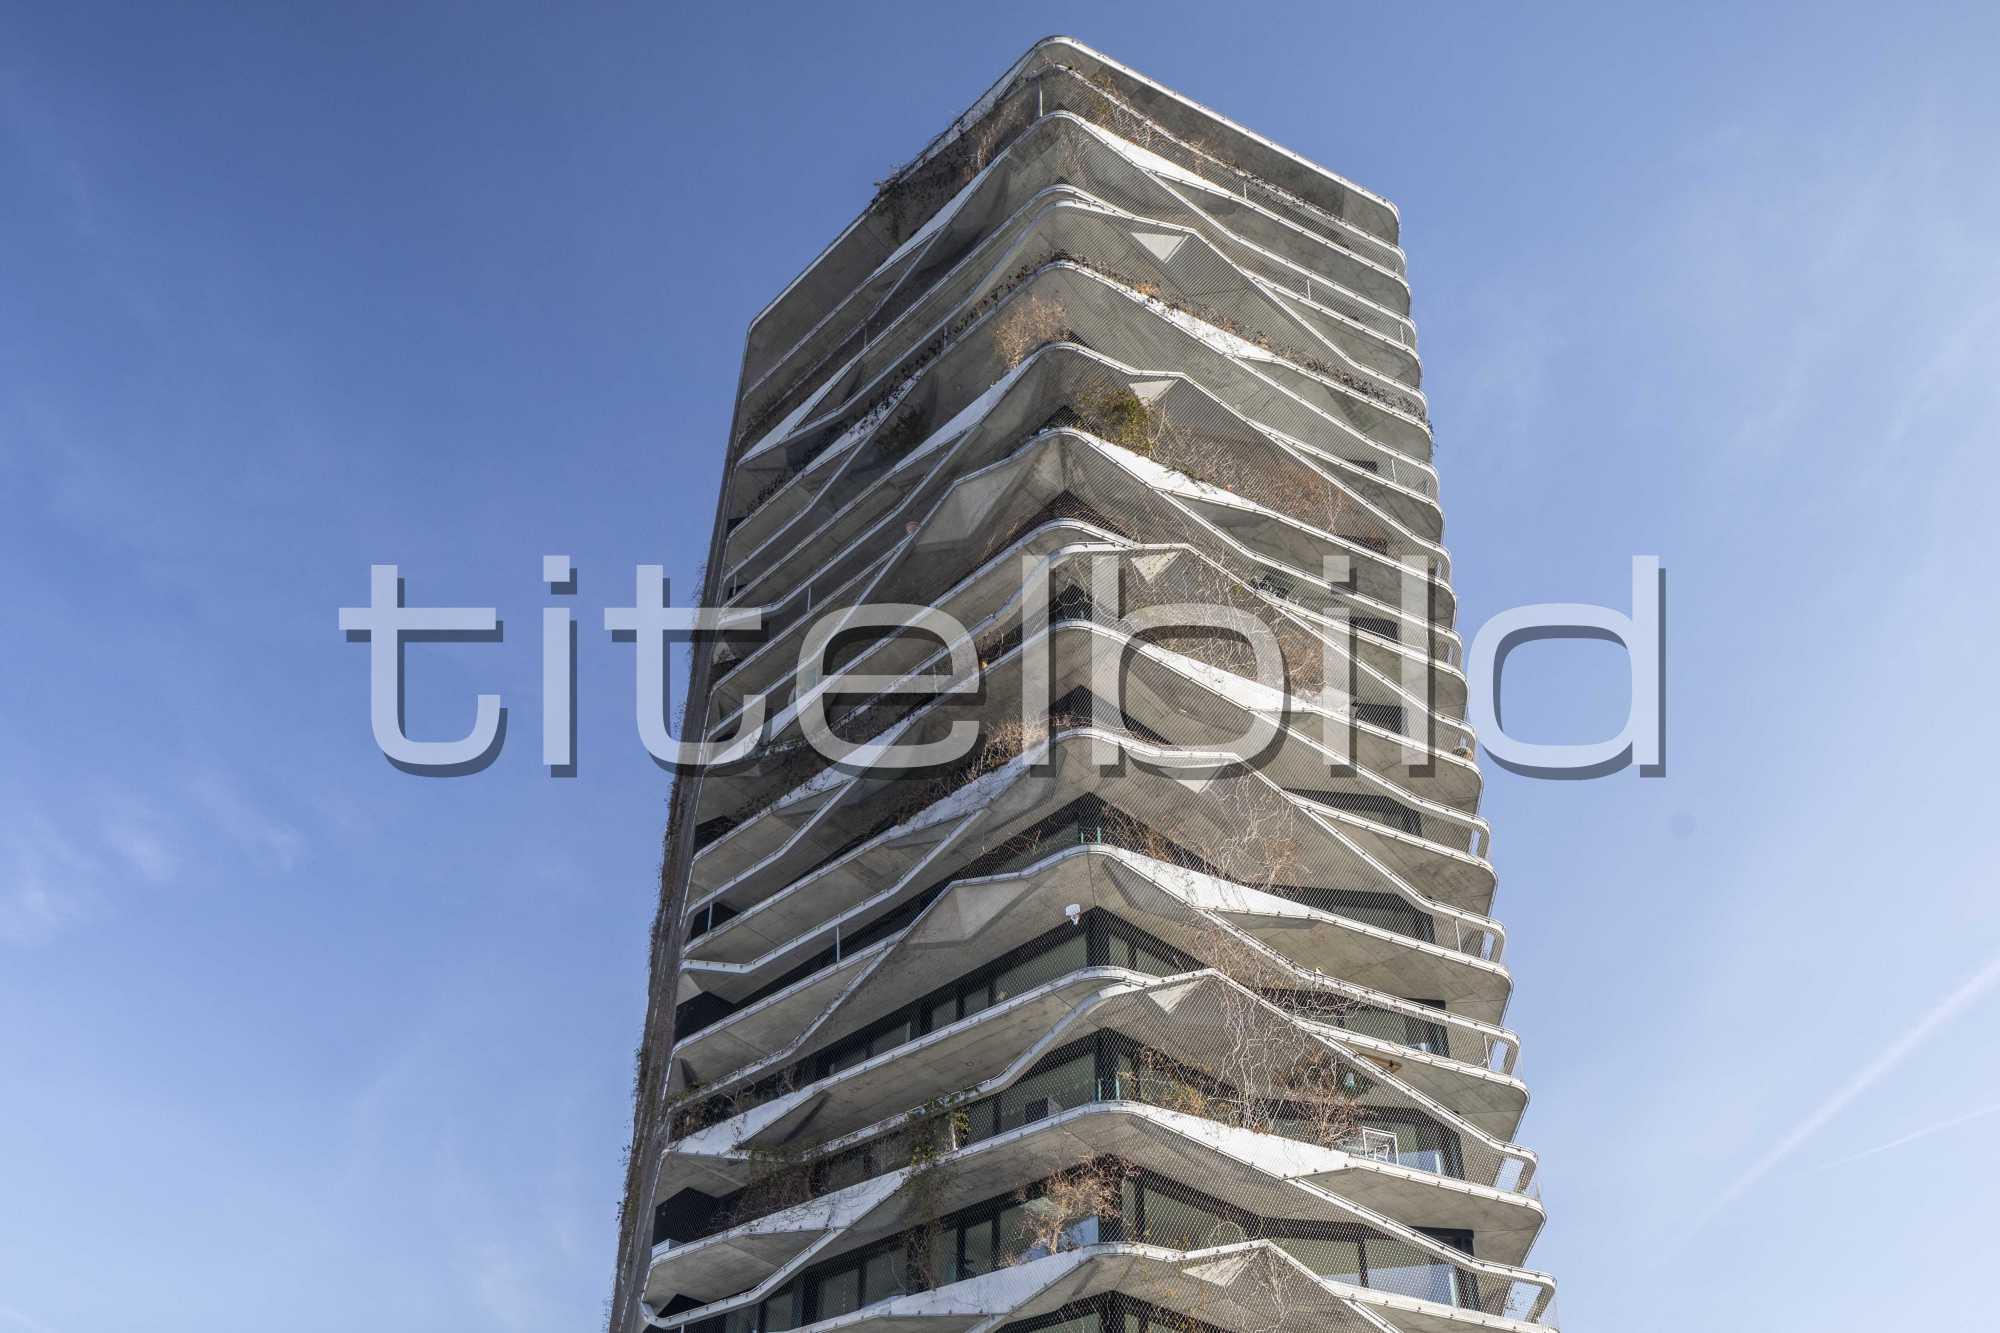 Projektbild-Nr. 4: Garden Tower Bächtelenpark Wabern